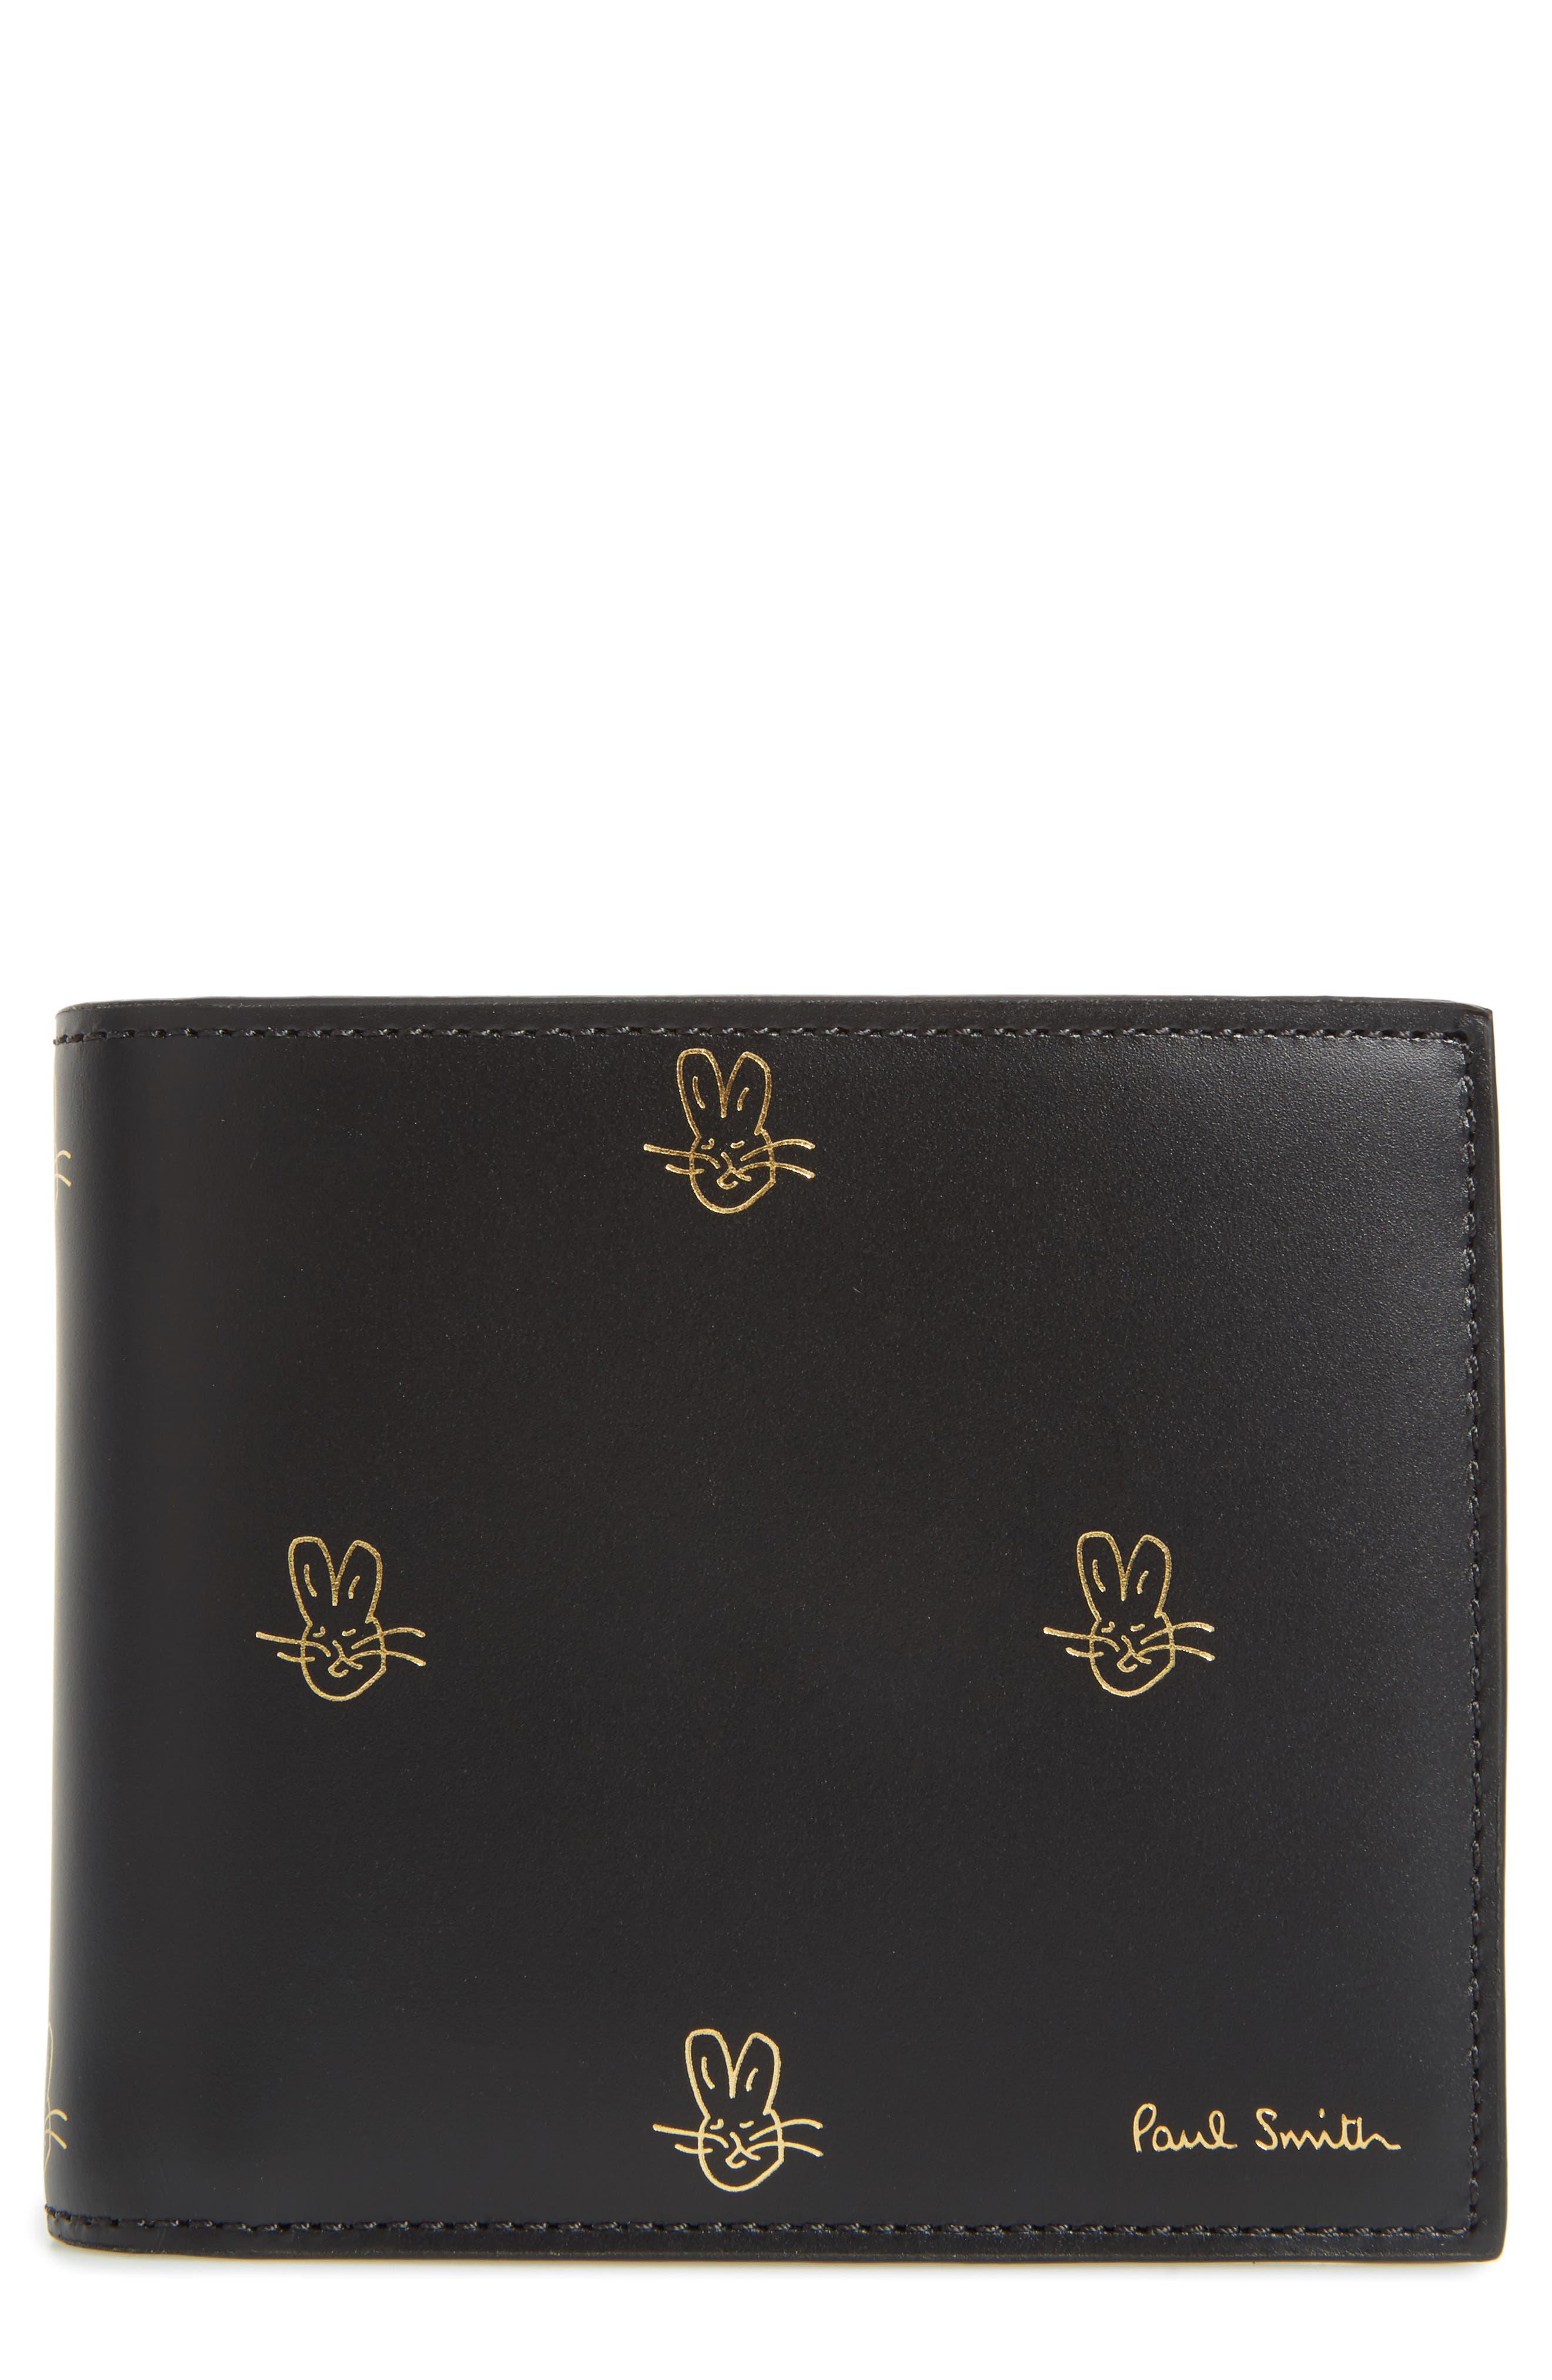 Doodles Leather Billfold Wallet,                         Main,                         color,